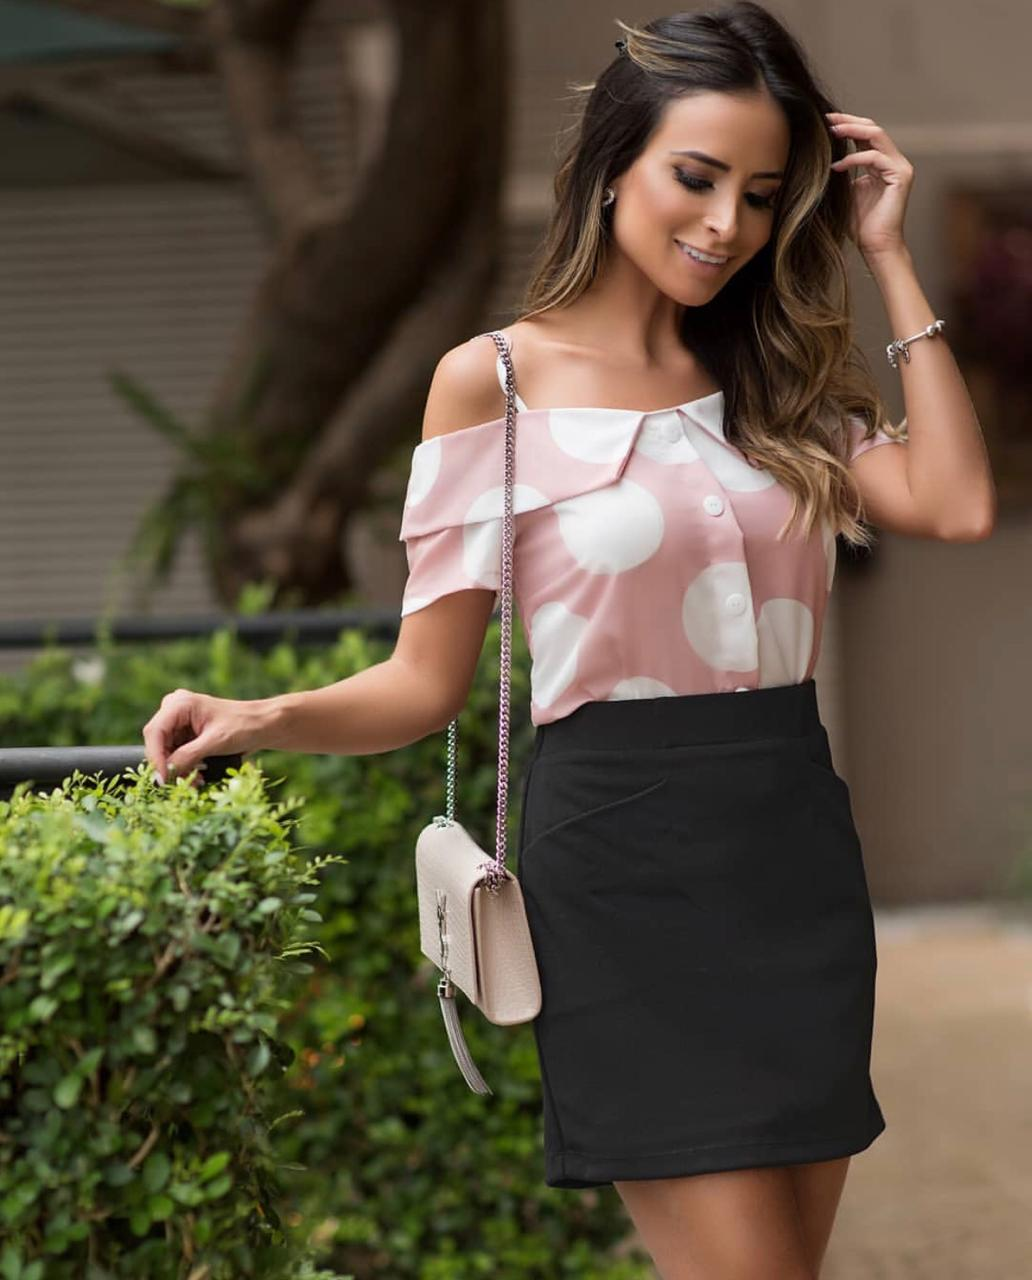 Blusa Poliana  Crepe Poas Ombro Vazado Rose e Preto